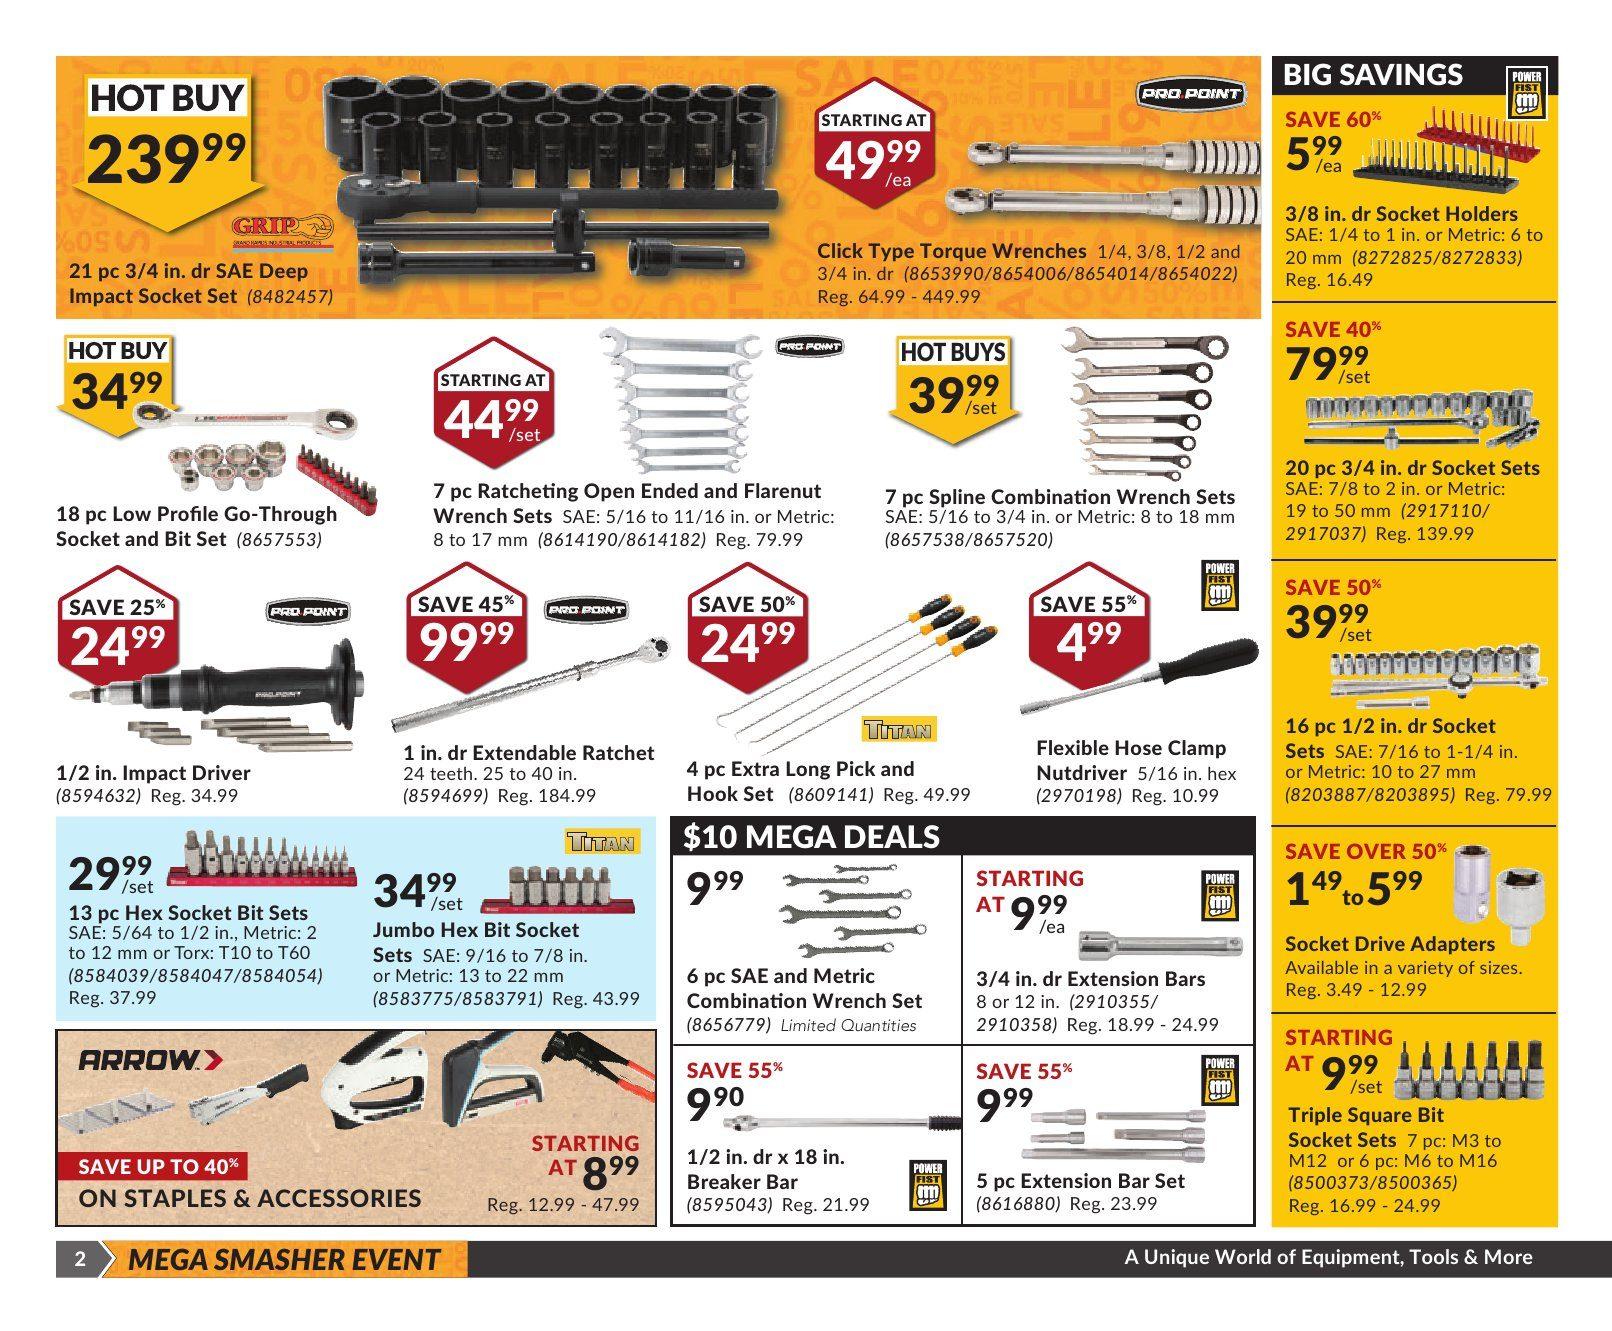 Princess Auto Weekly Flyer - Mega Smasher - Sep 20 – Oct 2 ...